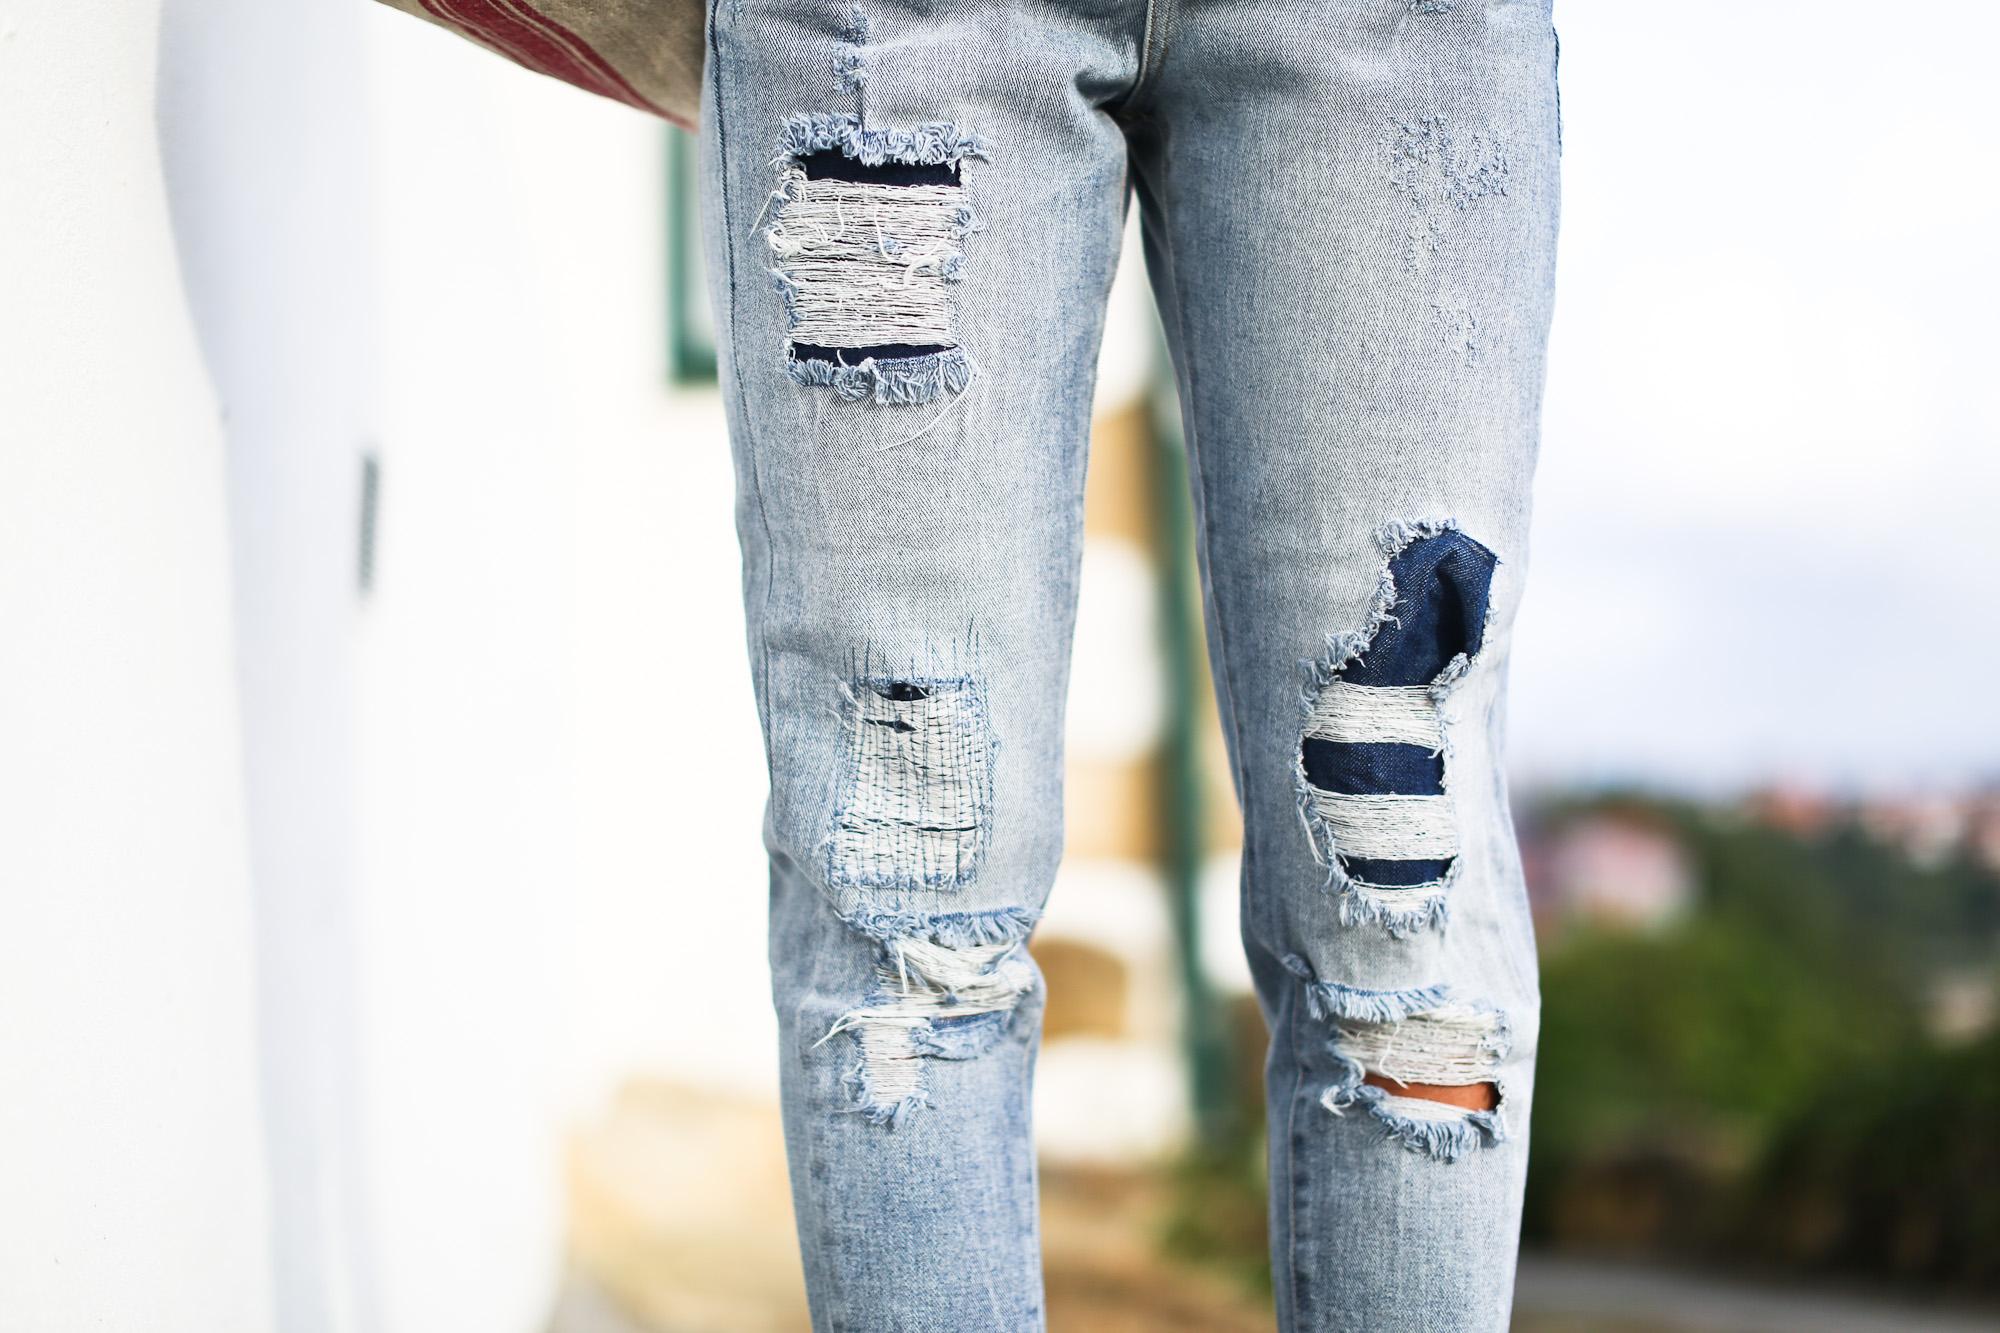 Clochet_streetstyle_suiteblanco_boyfriend_jeans_bandana_scarf_mg_linen_bag-7